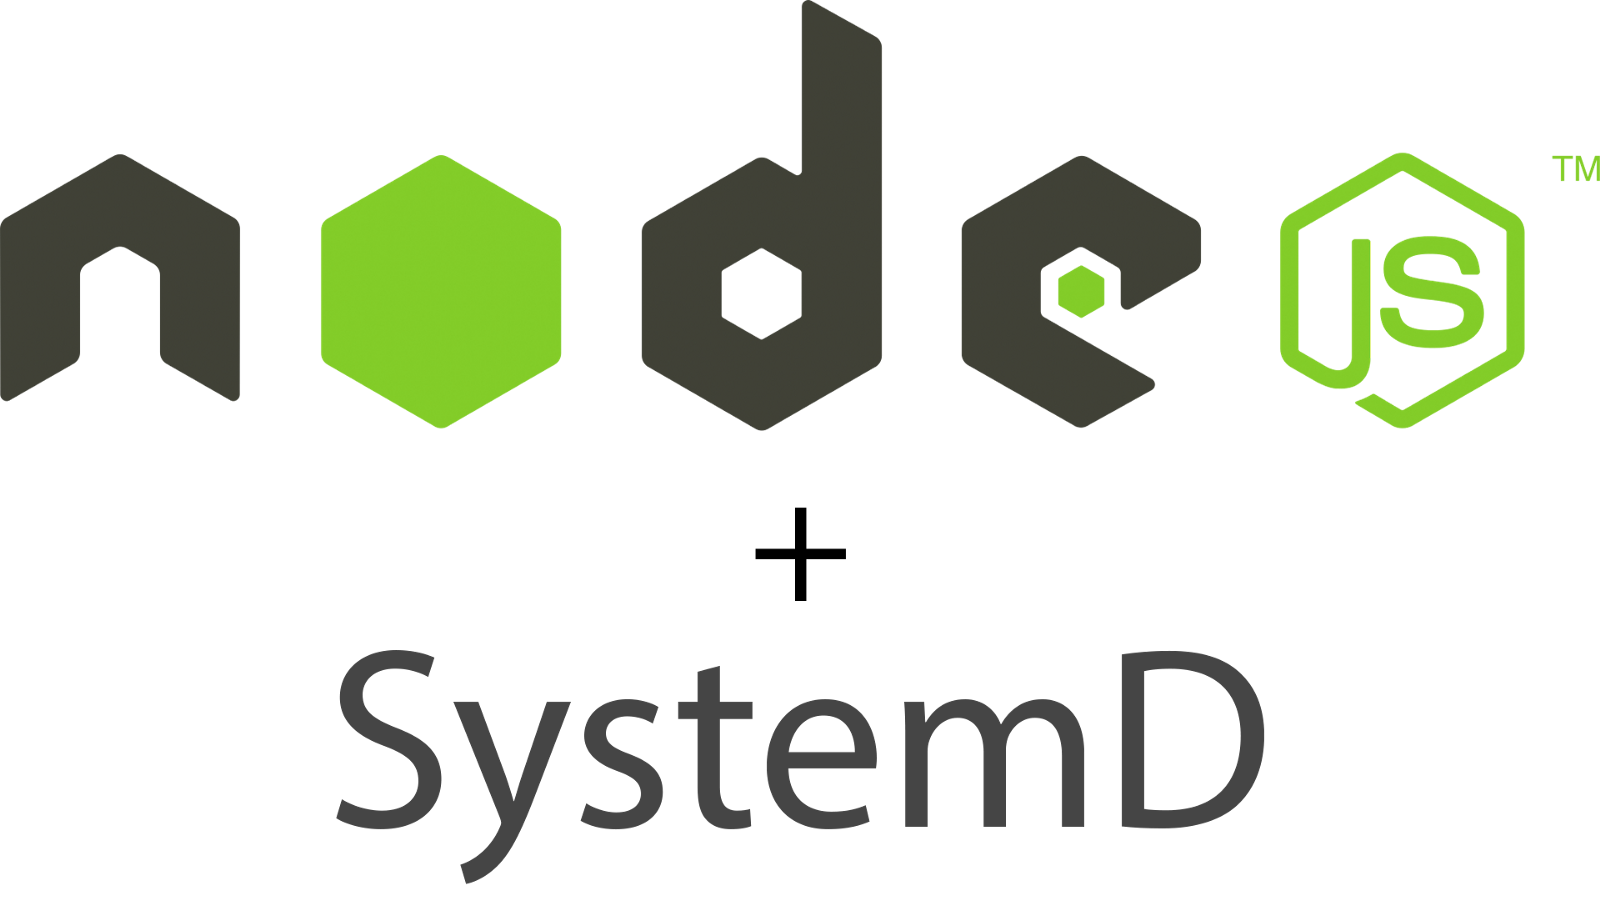 /making-node-js-service-always-alive-on-ubuntu-server-e20c9c0808e4 feature image